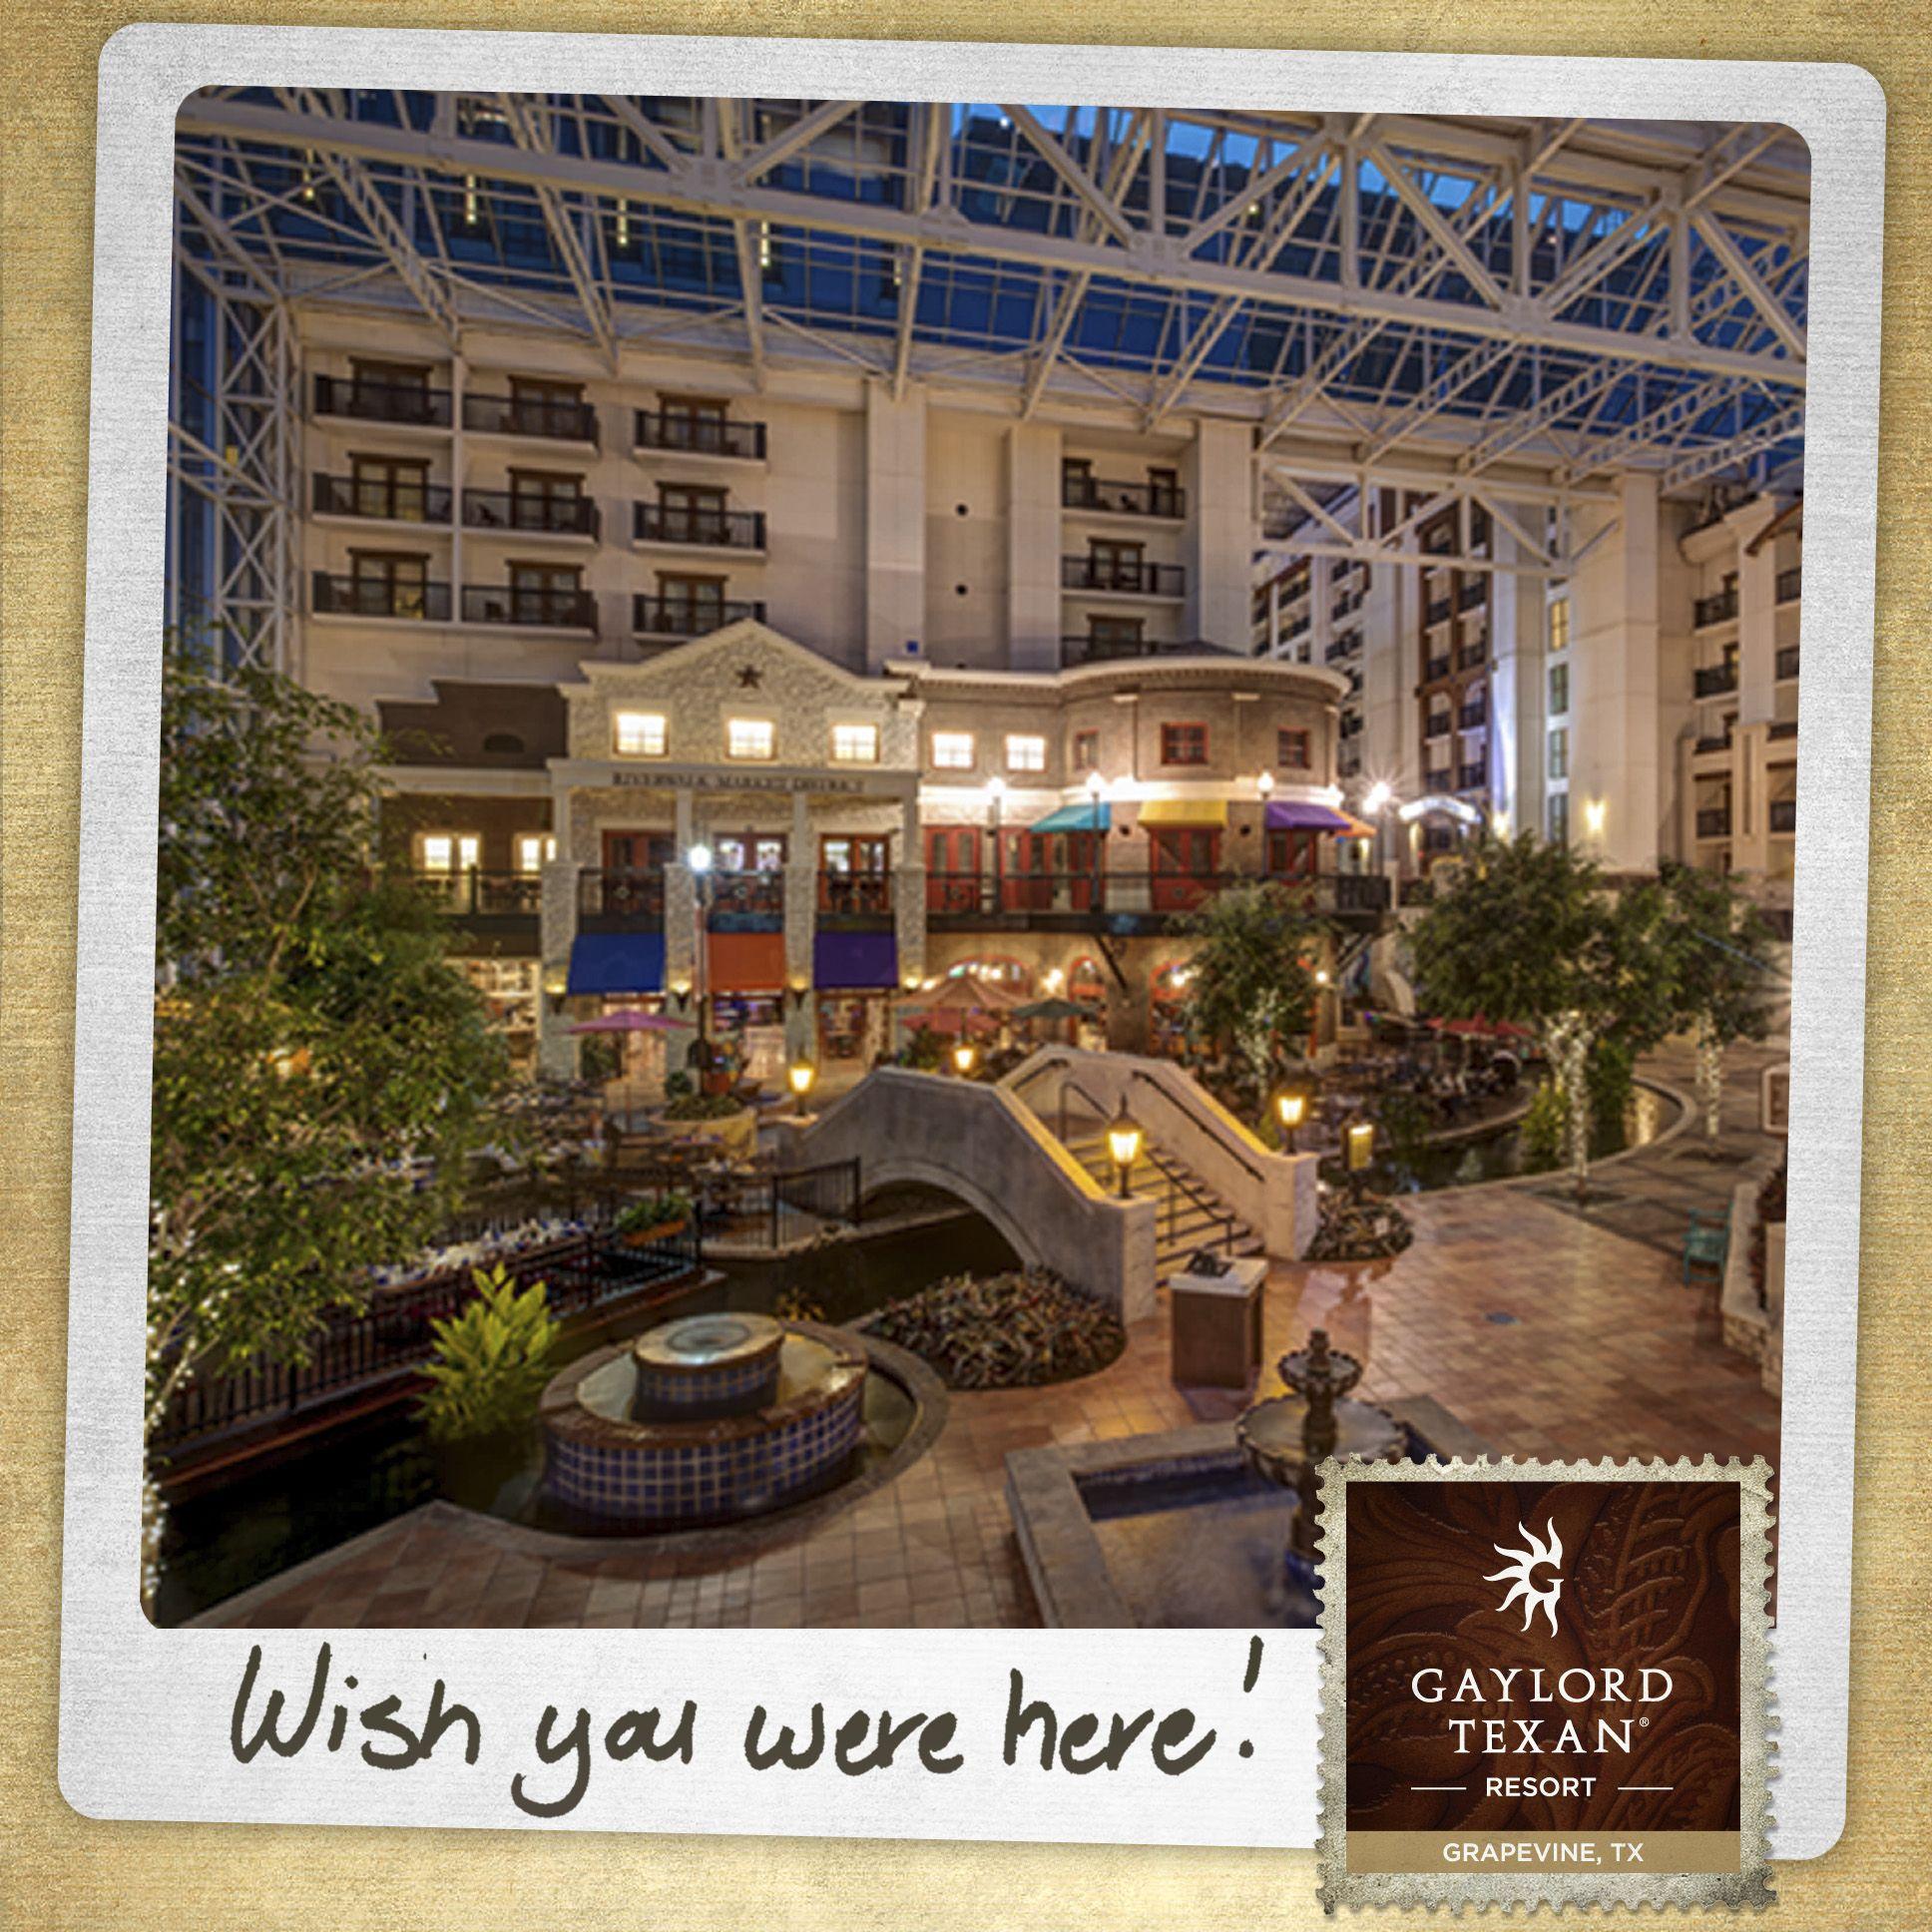 Gaylord Texan Resort In Grapevine Tx Riverwalk Atrium